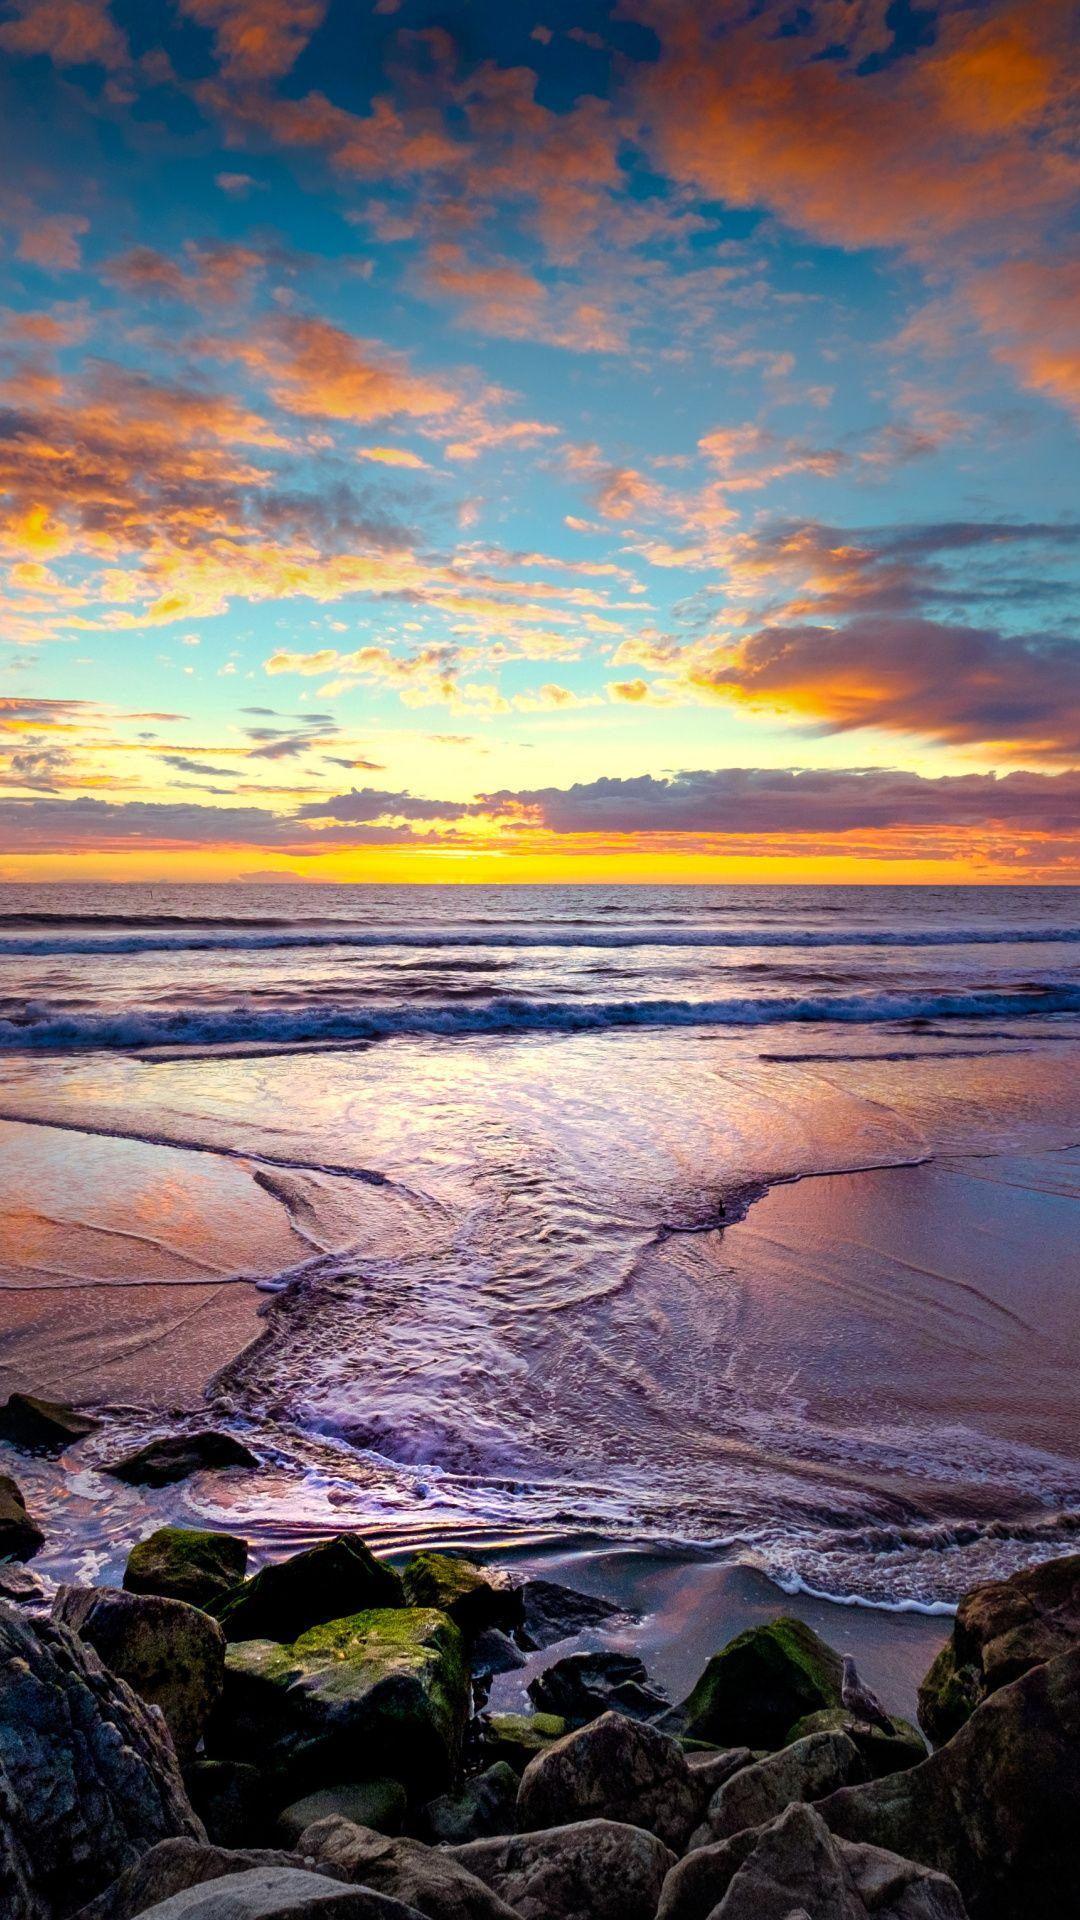 Sea Waves Coast Rocks Sunset Beautiful 1080x1920 Wallpaper Sea Waves Beautiful Wallpapers Aesthetic Photography Nature